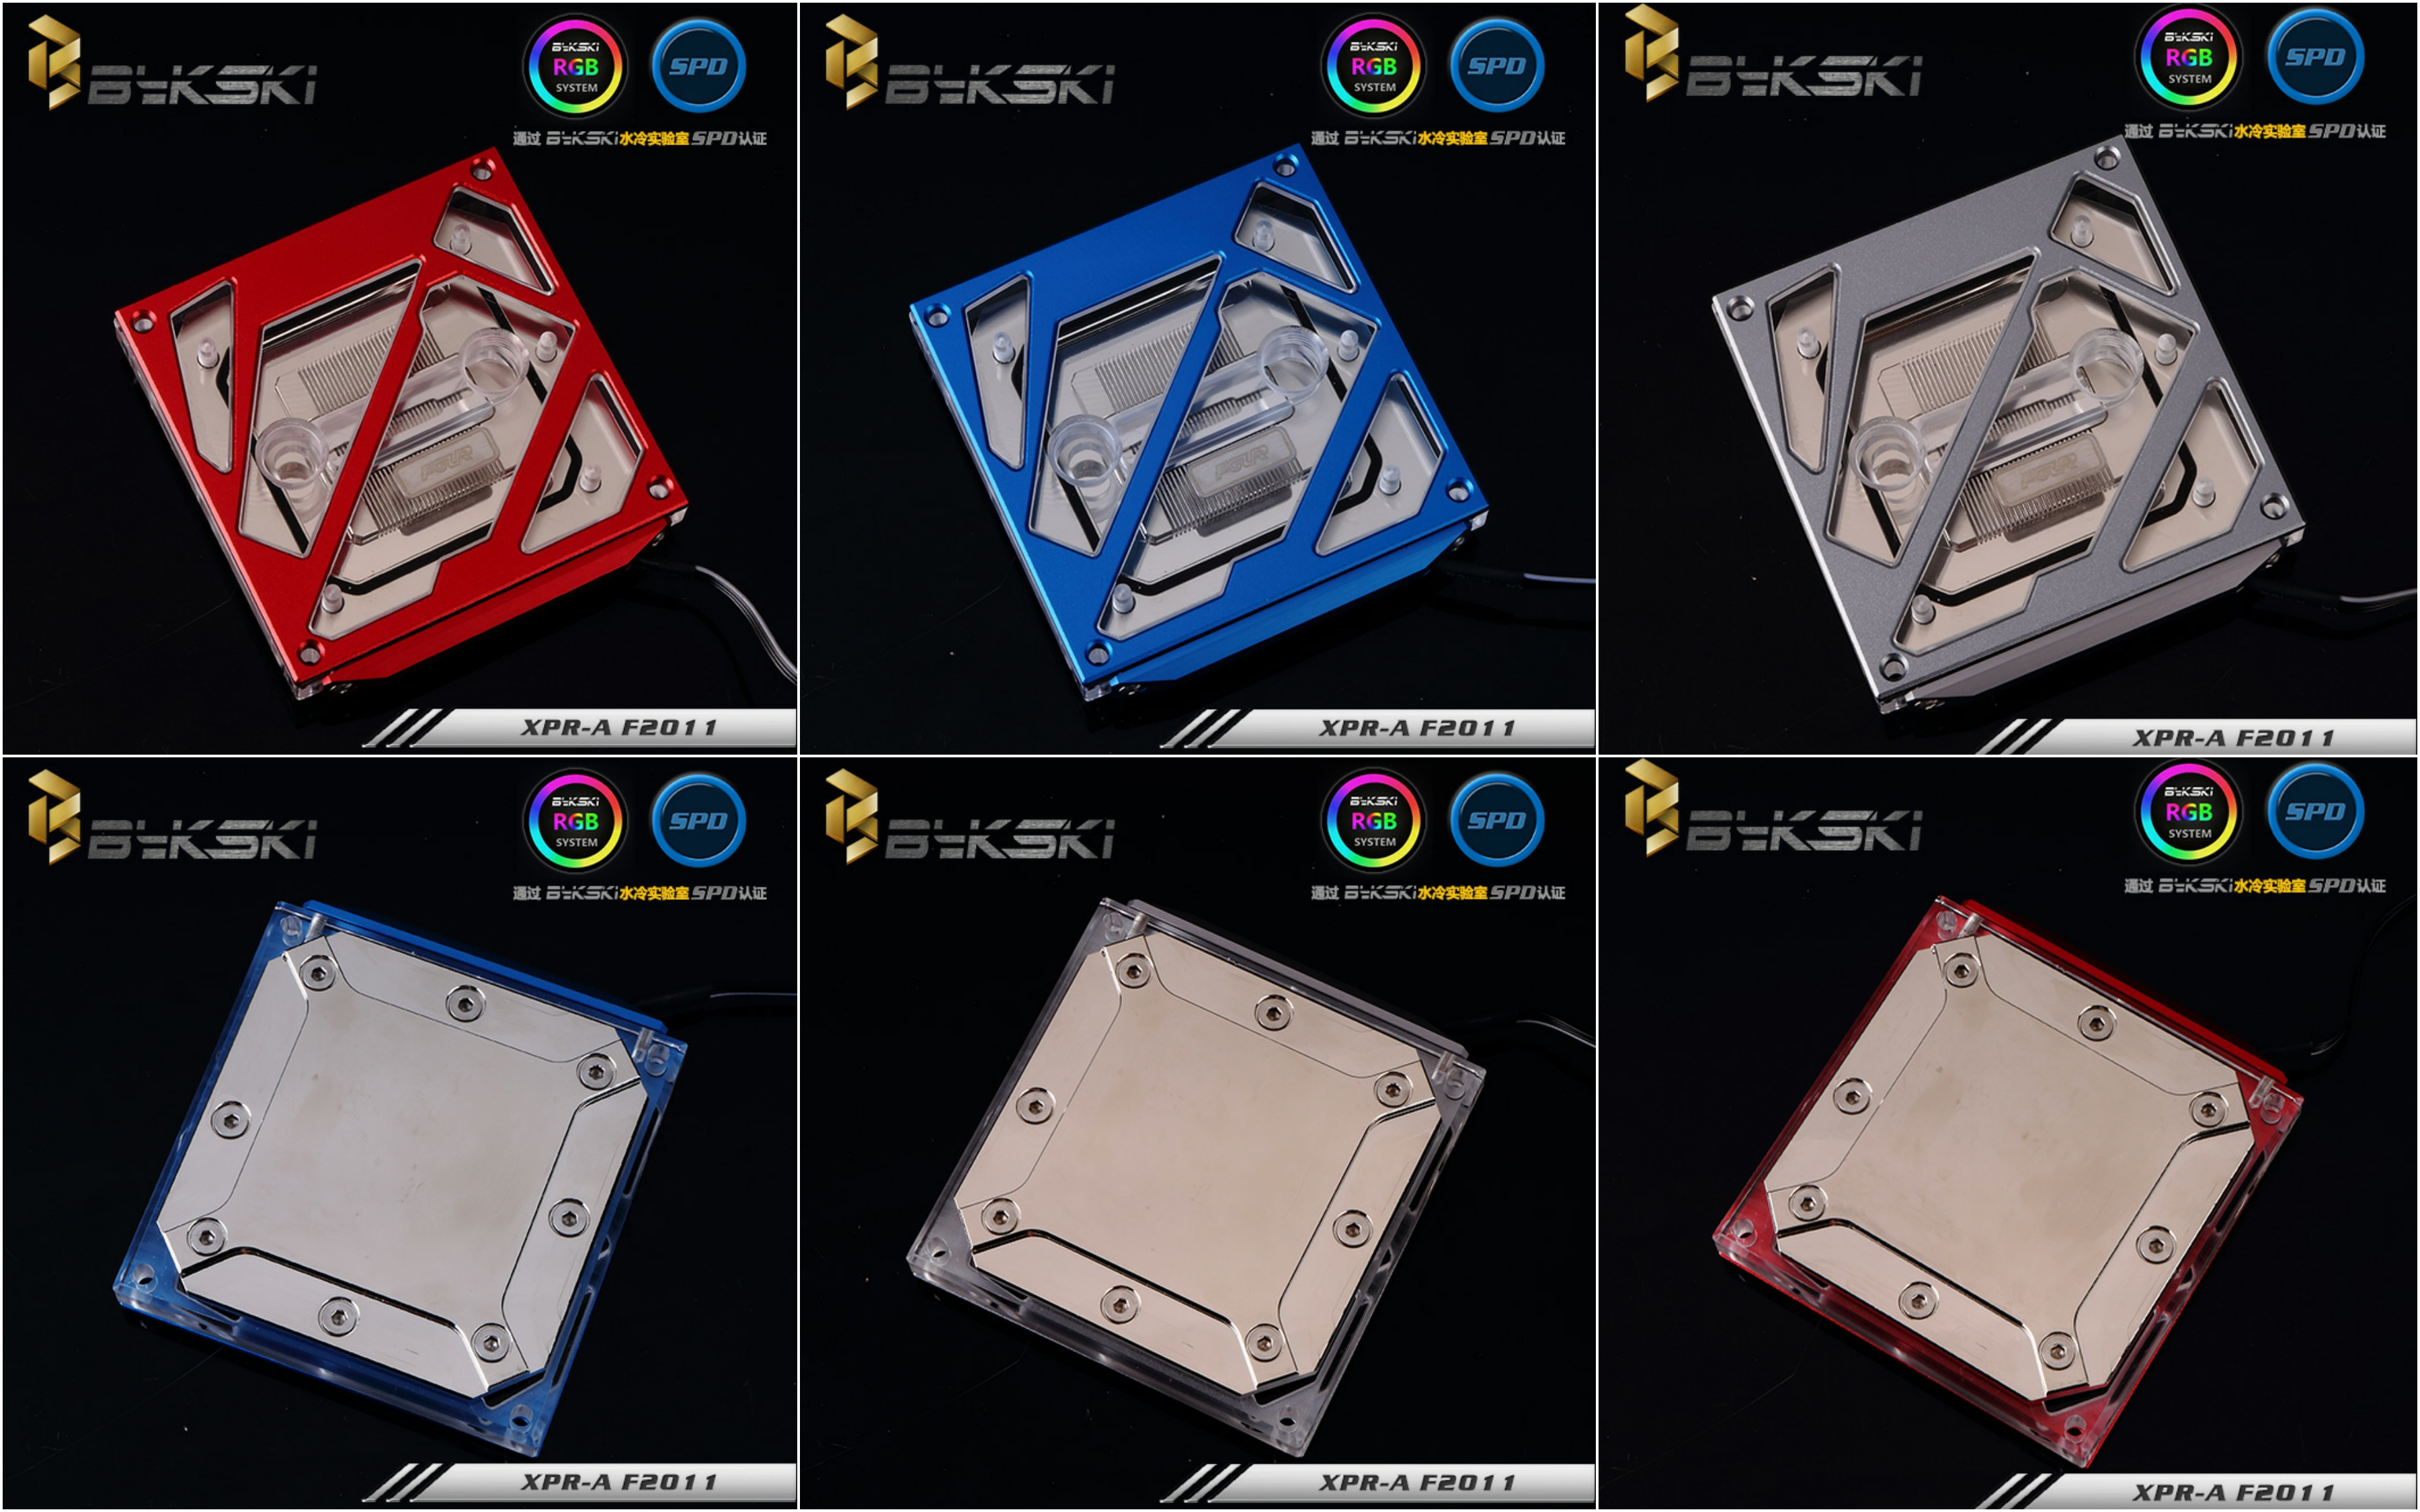 Bykski XPR-A v3 F2011 CPU Water Cooling Block 85x85mm Intel X99 X299 2011 2066 golf 3 td 2011